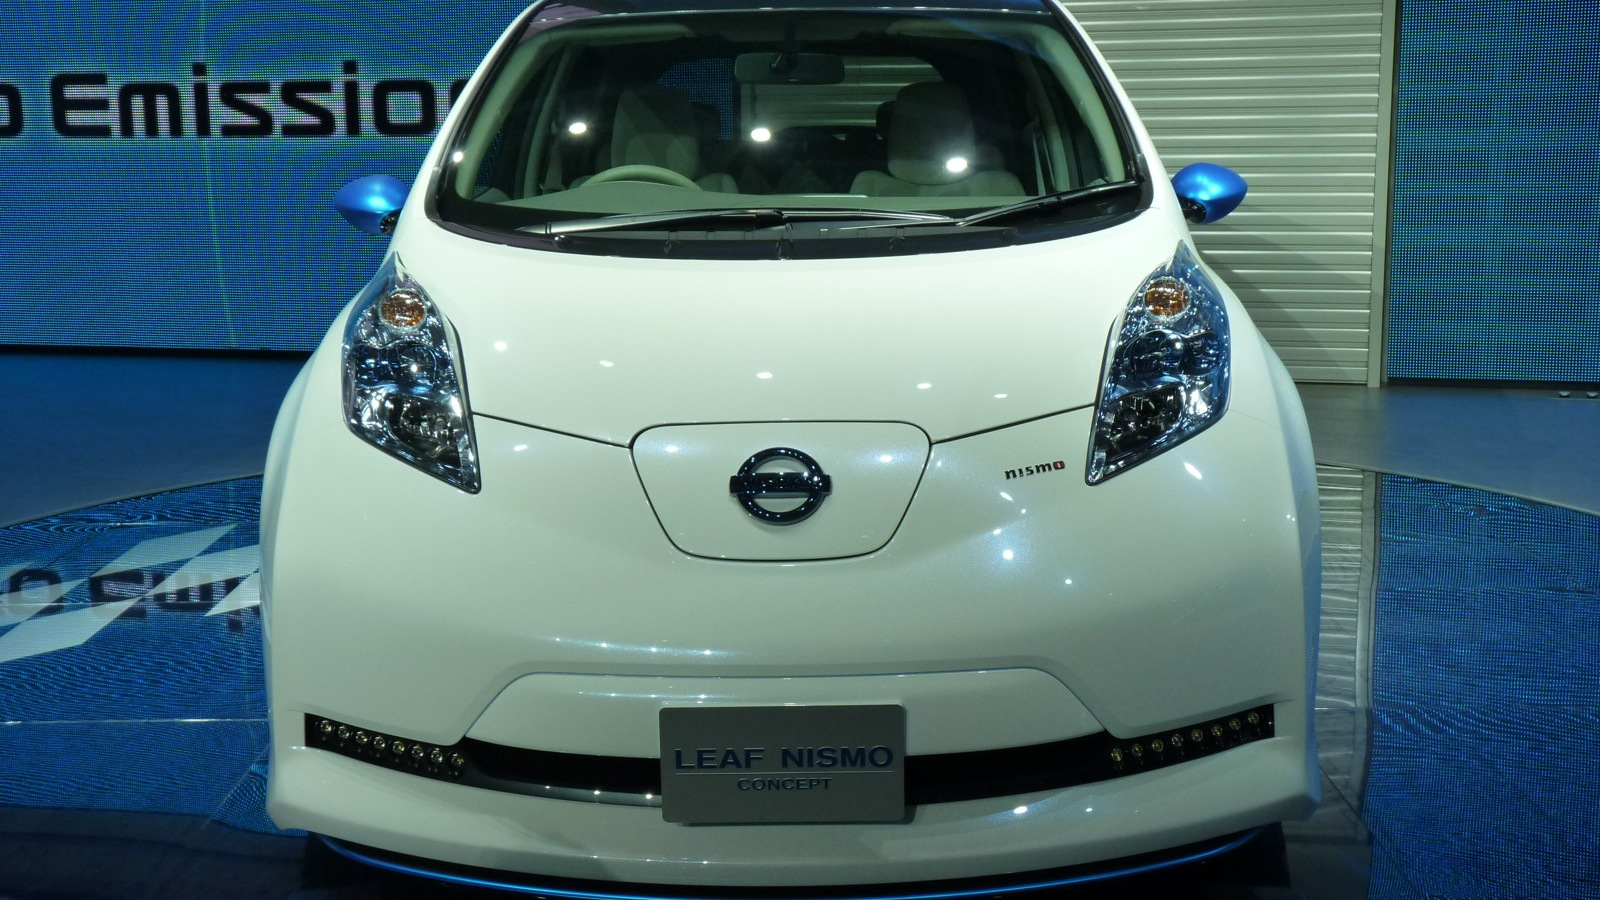 2011 Nissan Leaf NISMO concept